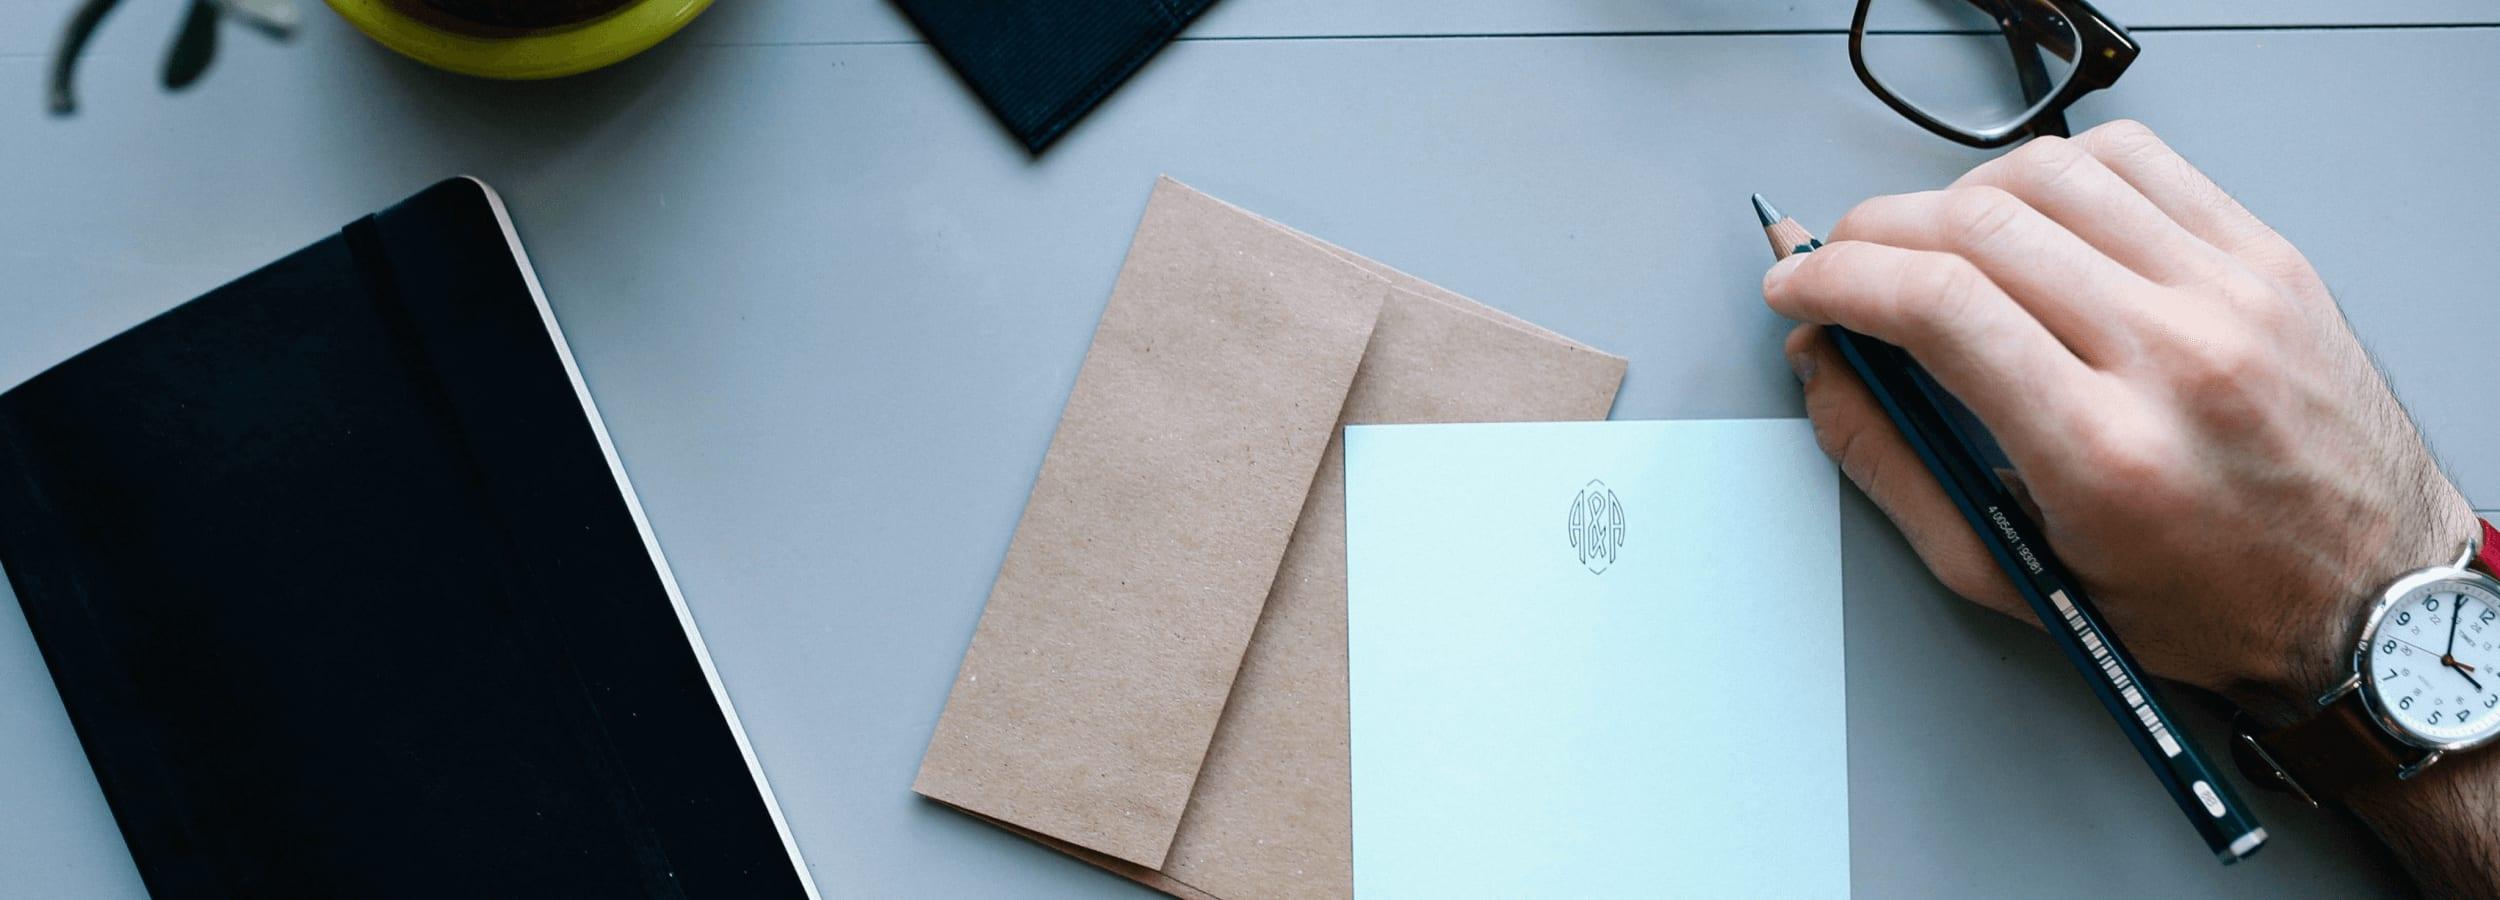 À quoi correspond Cedex sur les adresses postales ?